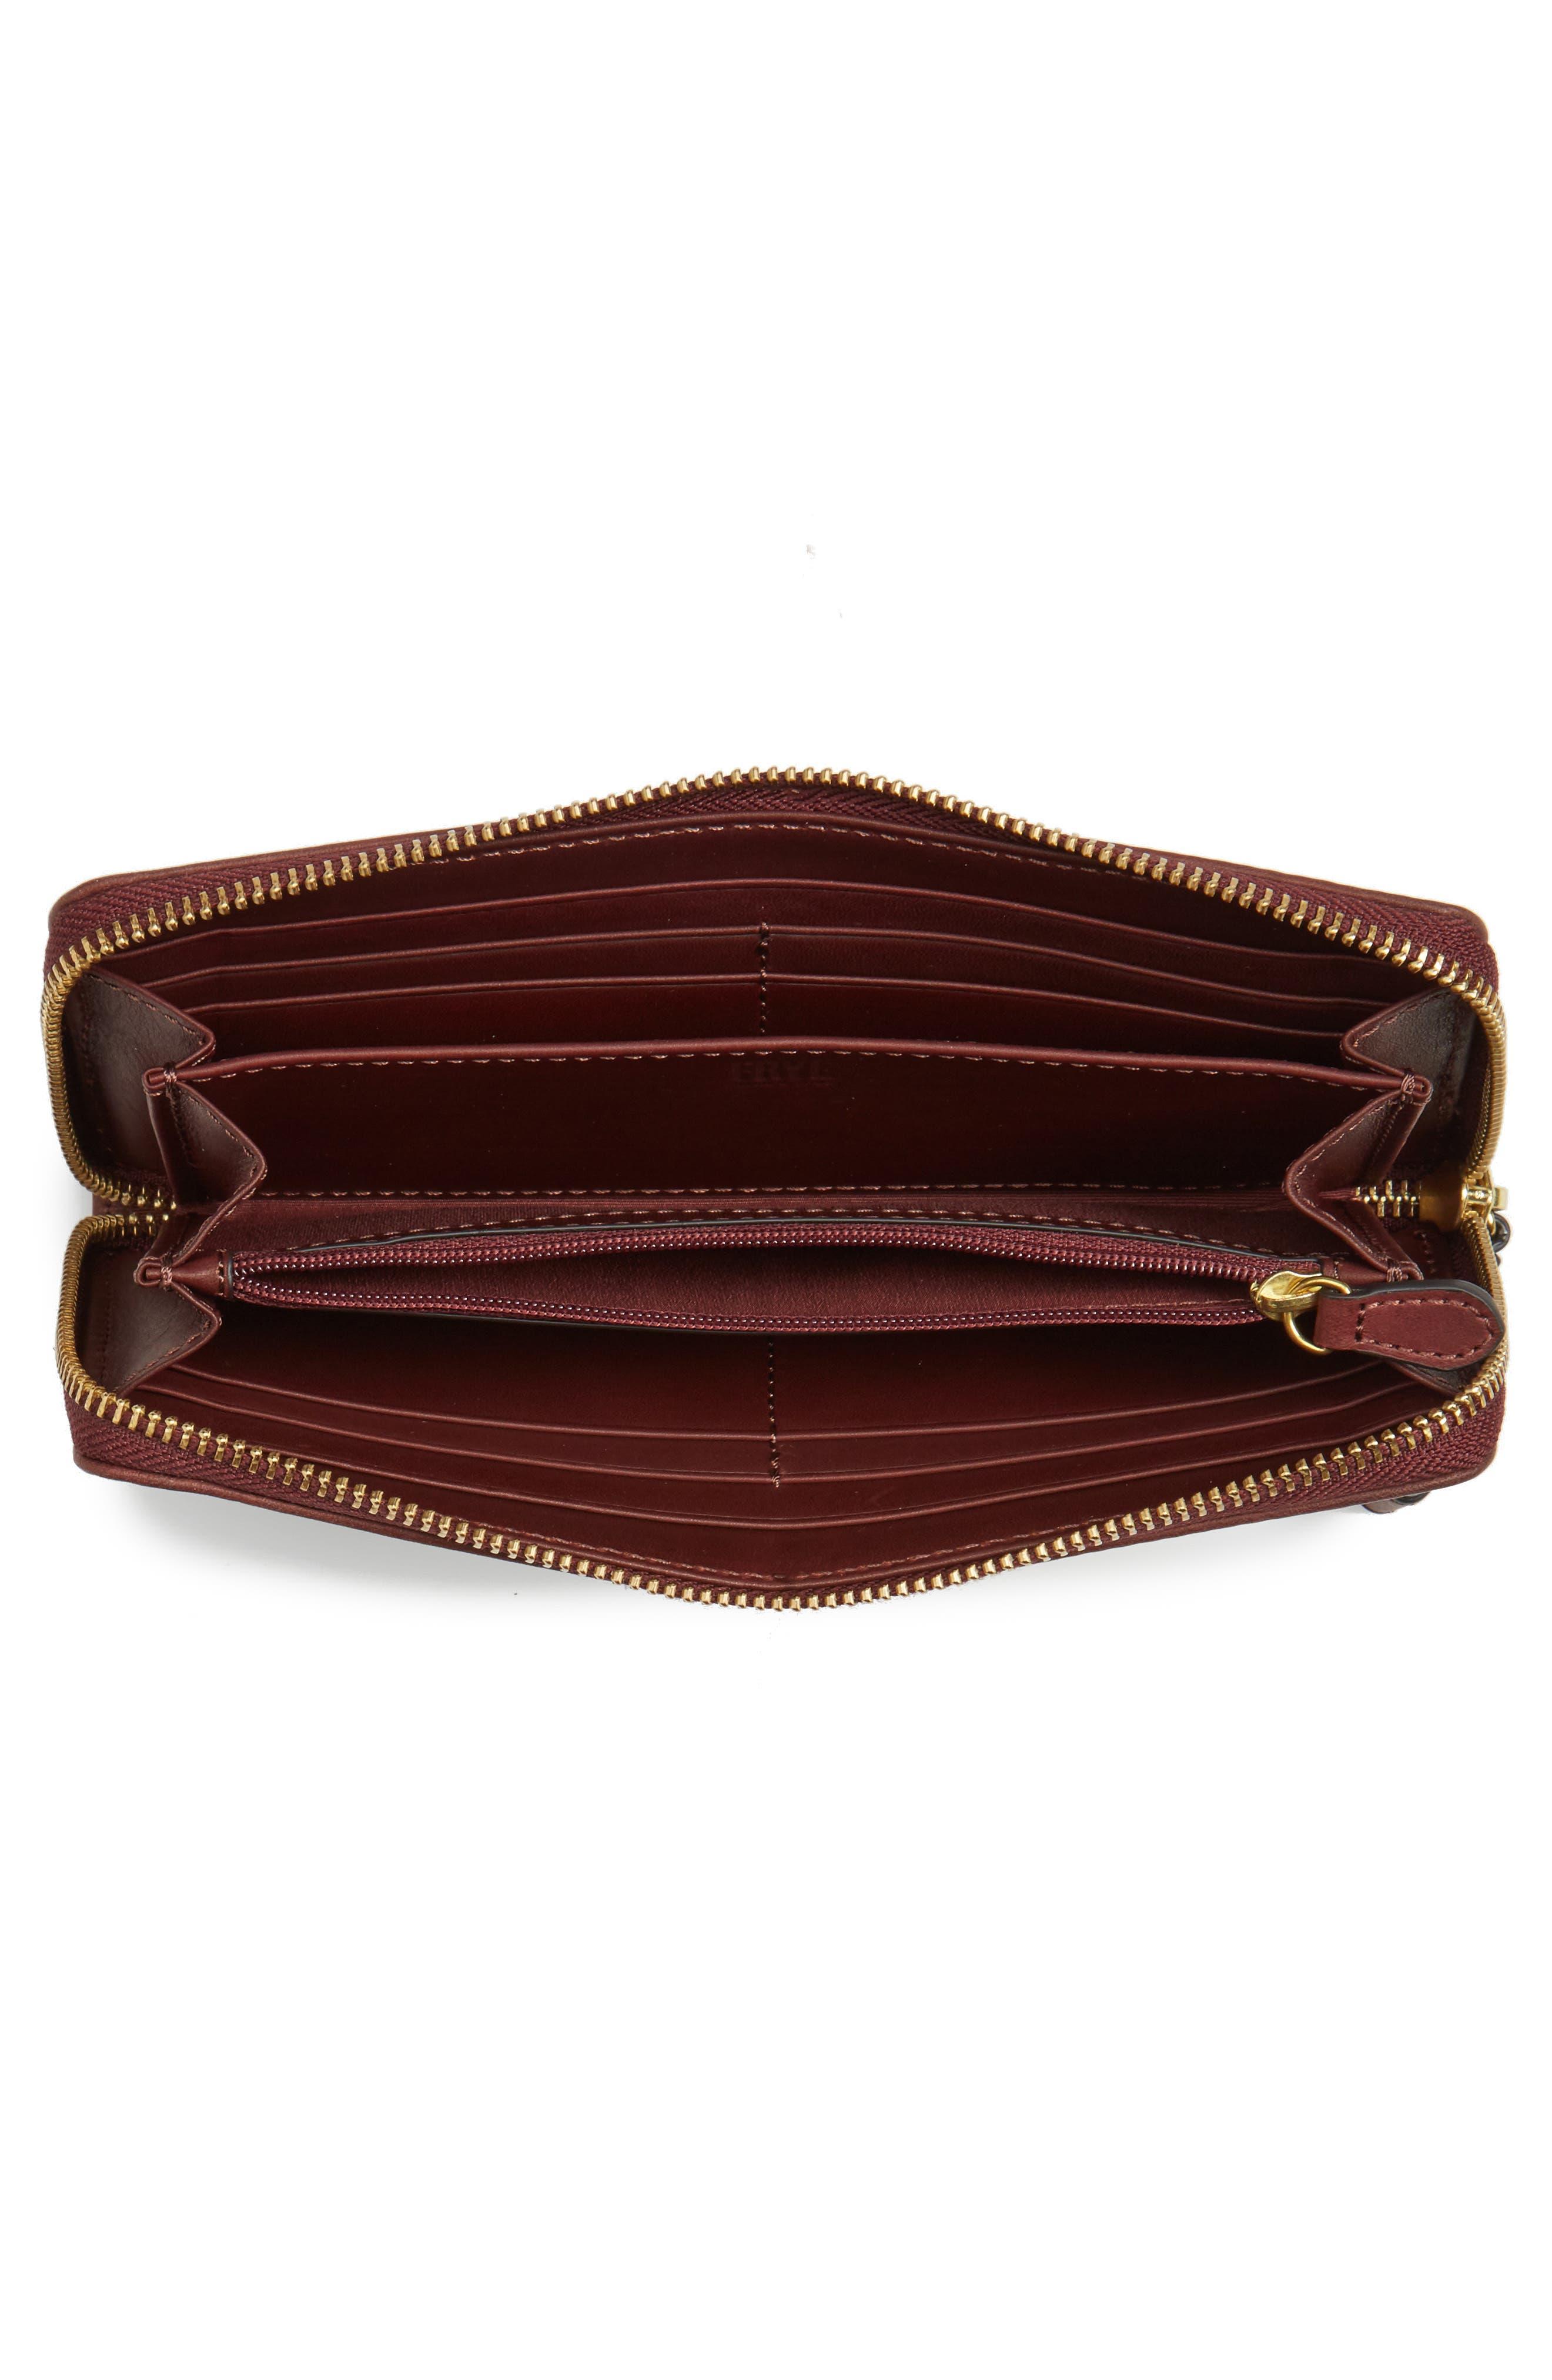 Campus Rivet Leather Continental Zip Wallet,                             Alternate thumbnail 10, color,